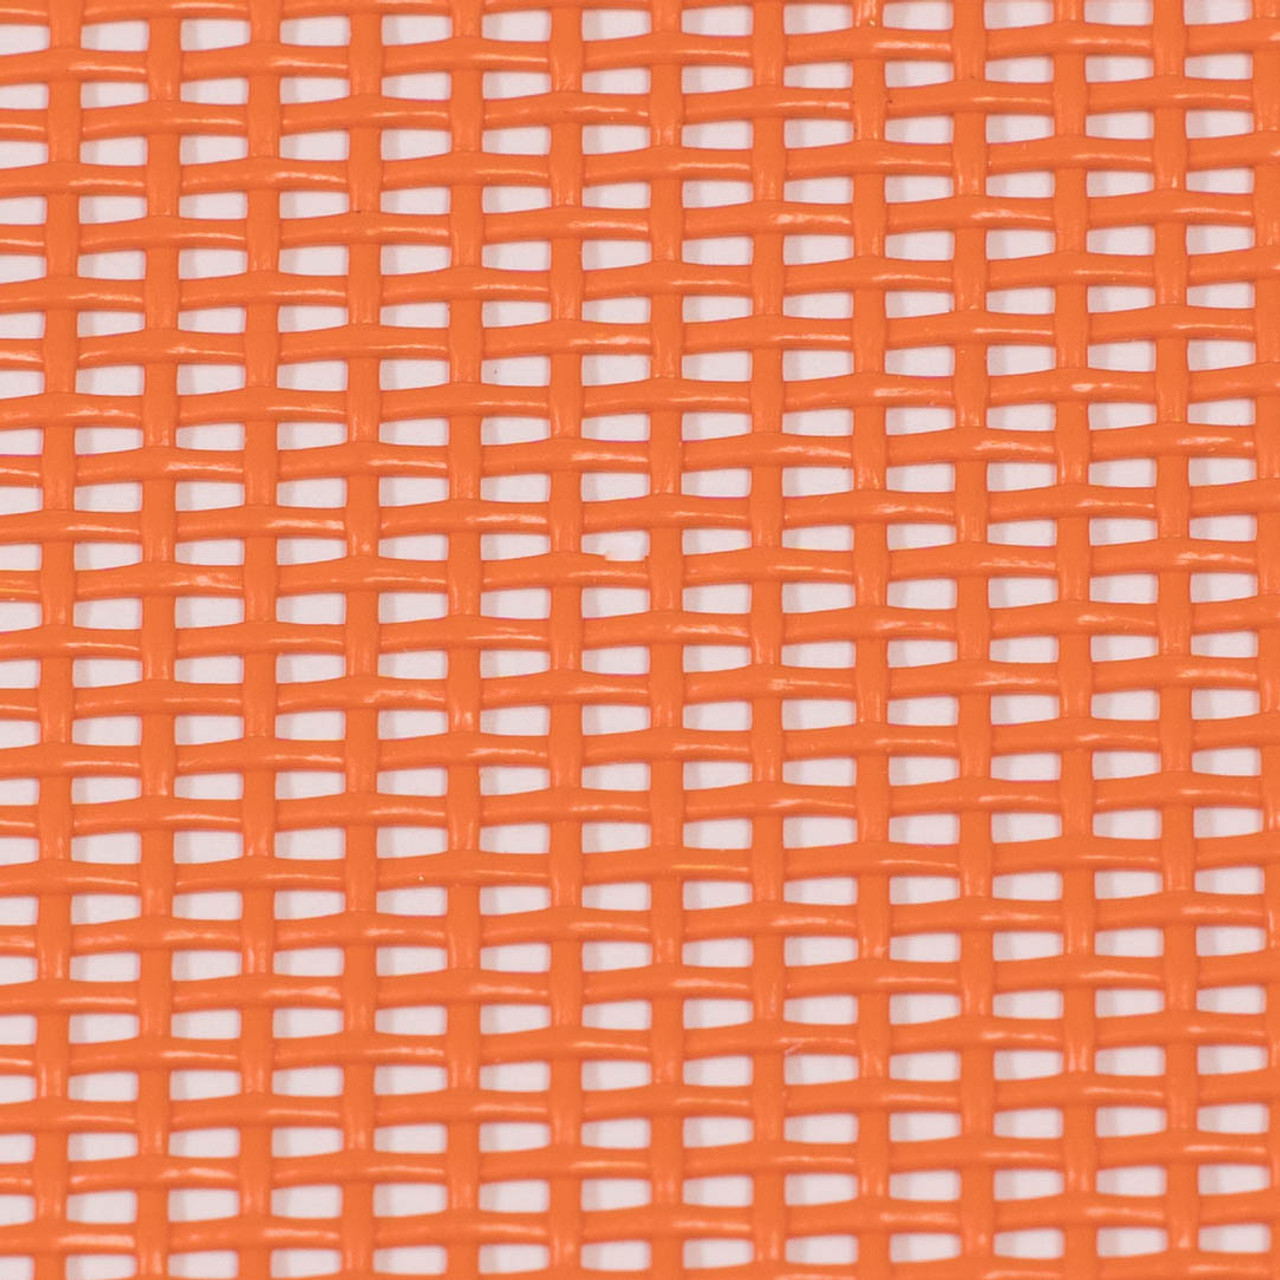 Orange Pet Screen 54 Inch x 100 Ft.